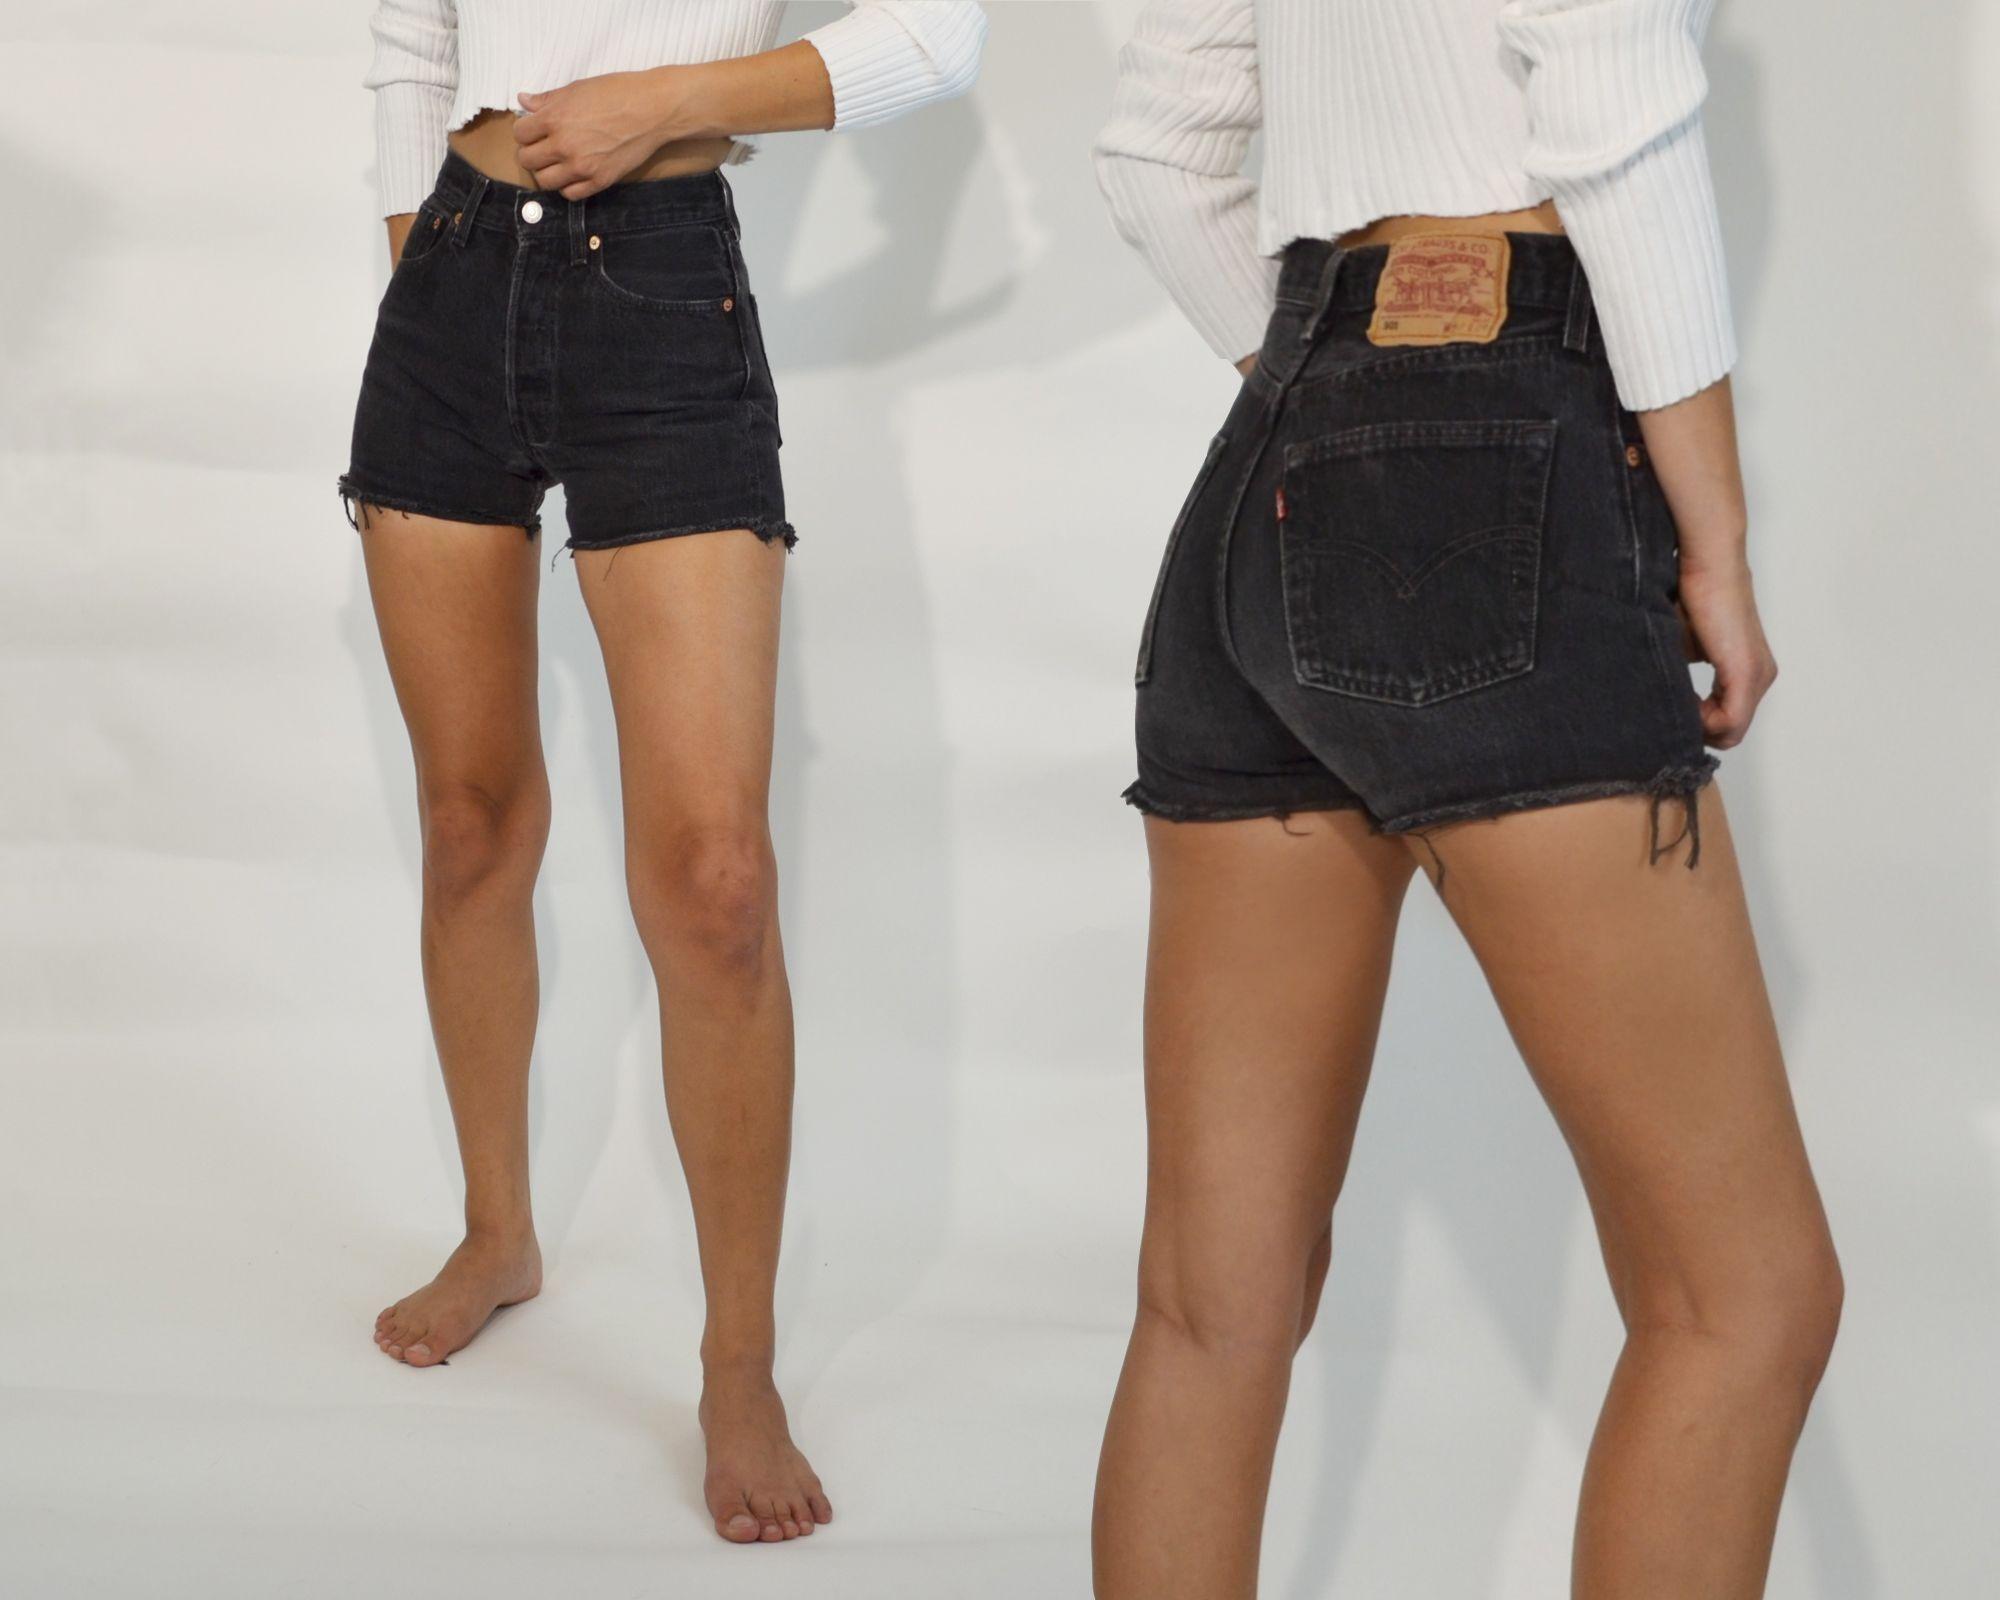 Vintage Levi S 501 Shorts Levi 501 Shorts Black Shorts Outfit Black Denim Shorts Outfit